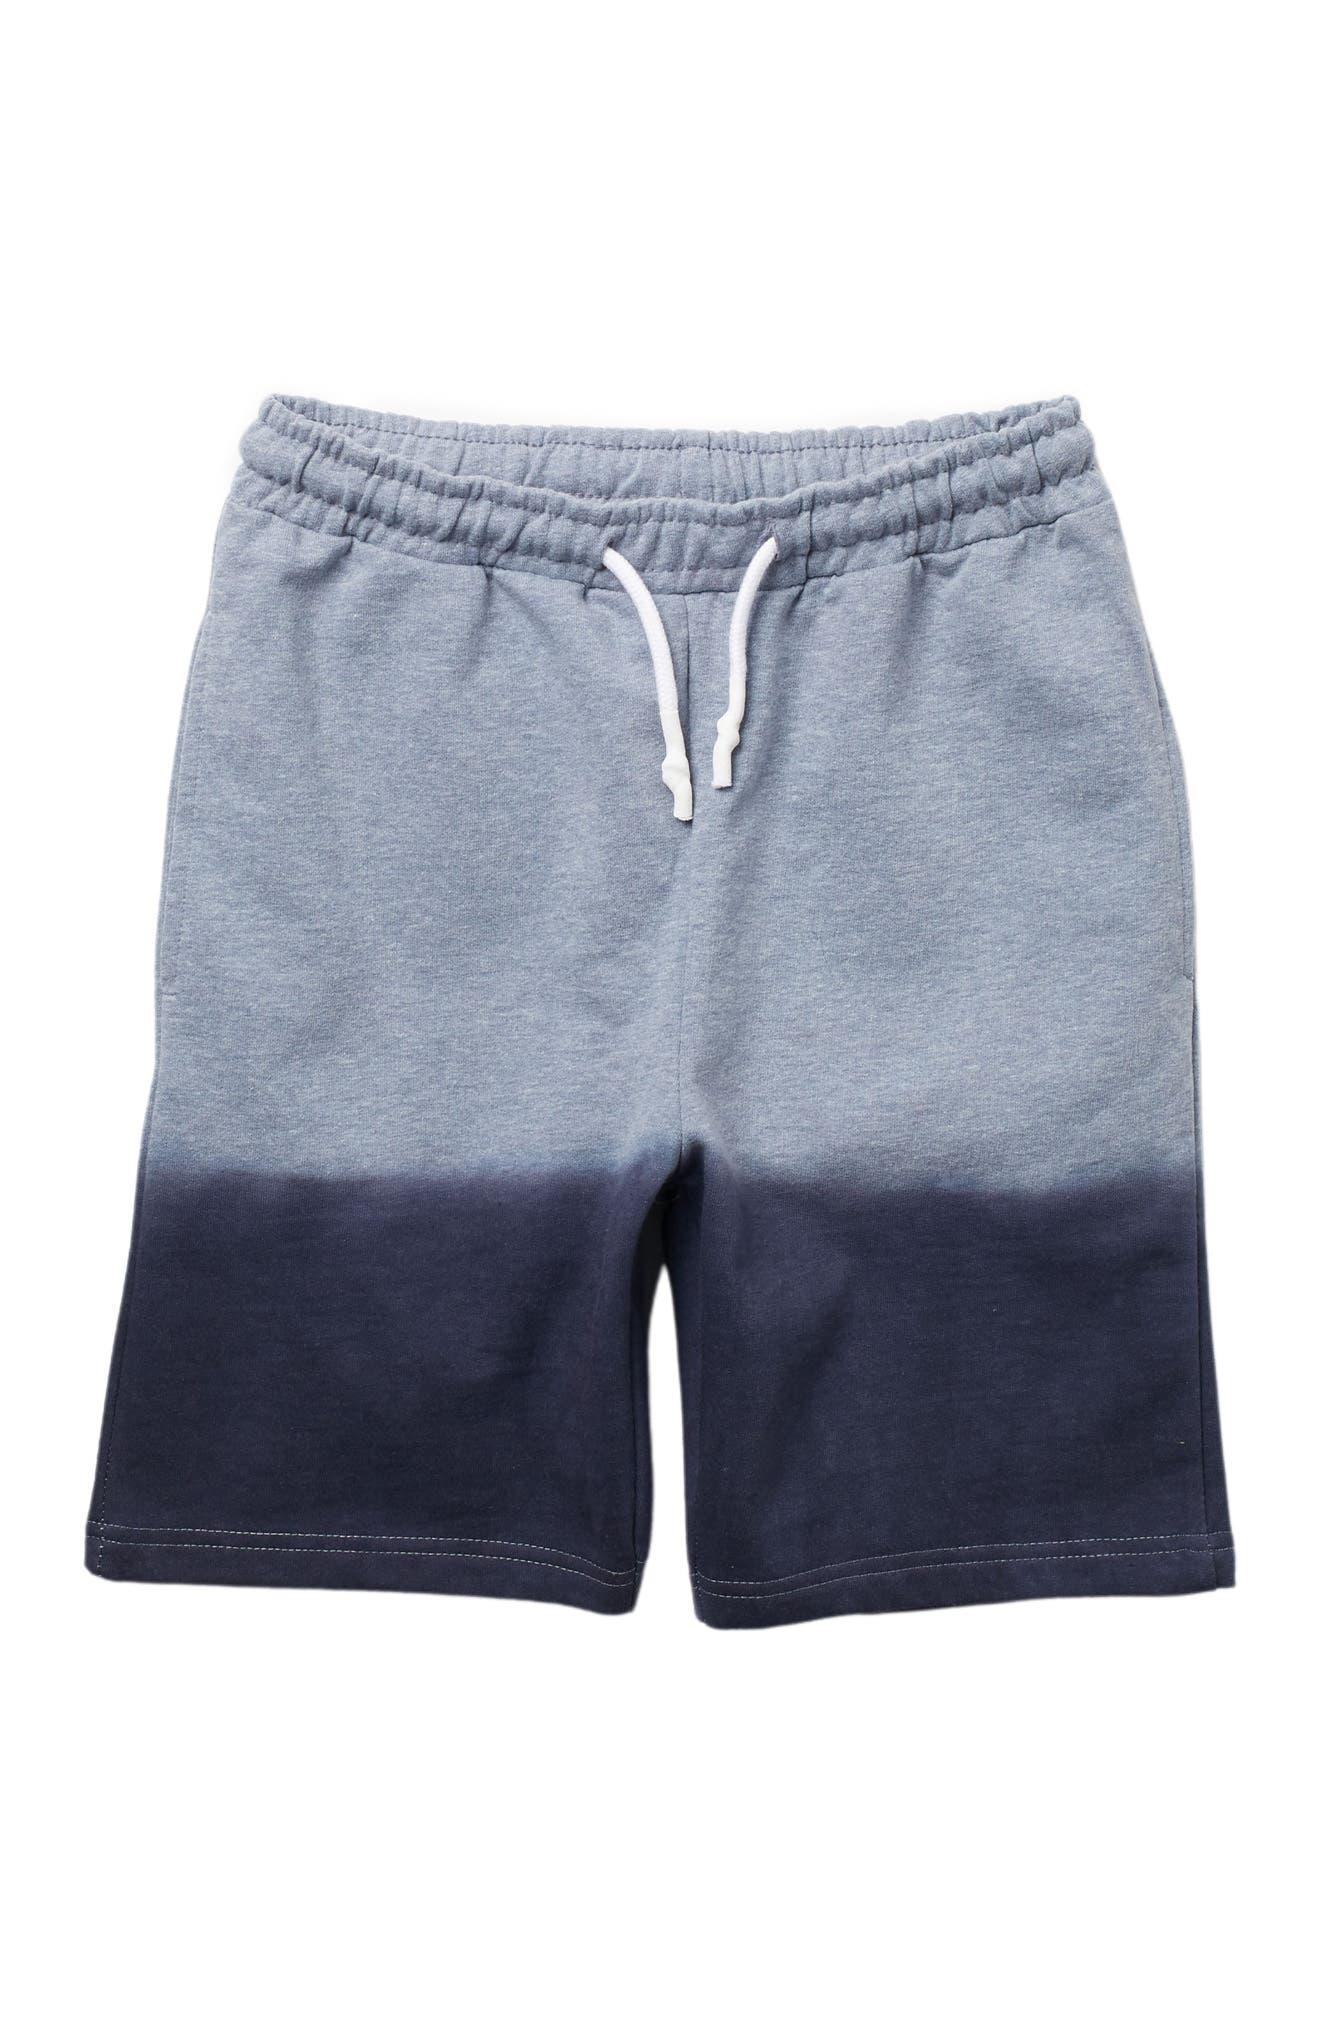 Image of Sovereign Code Warner Knit Shorts